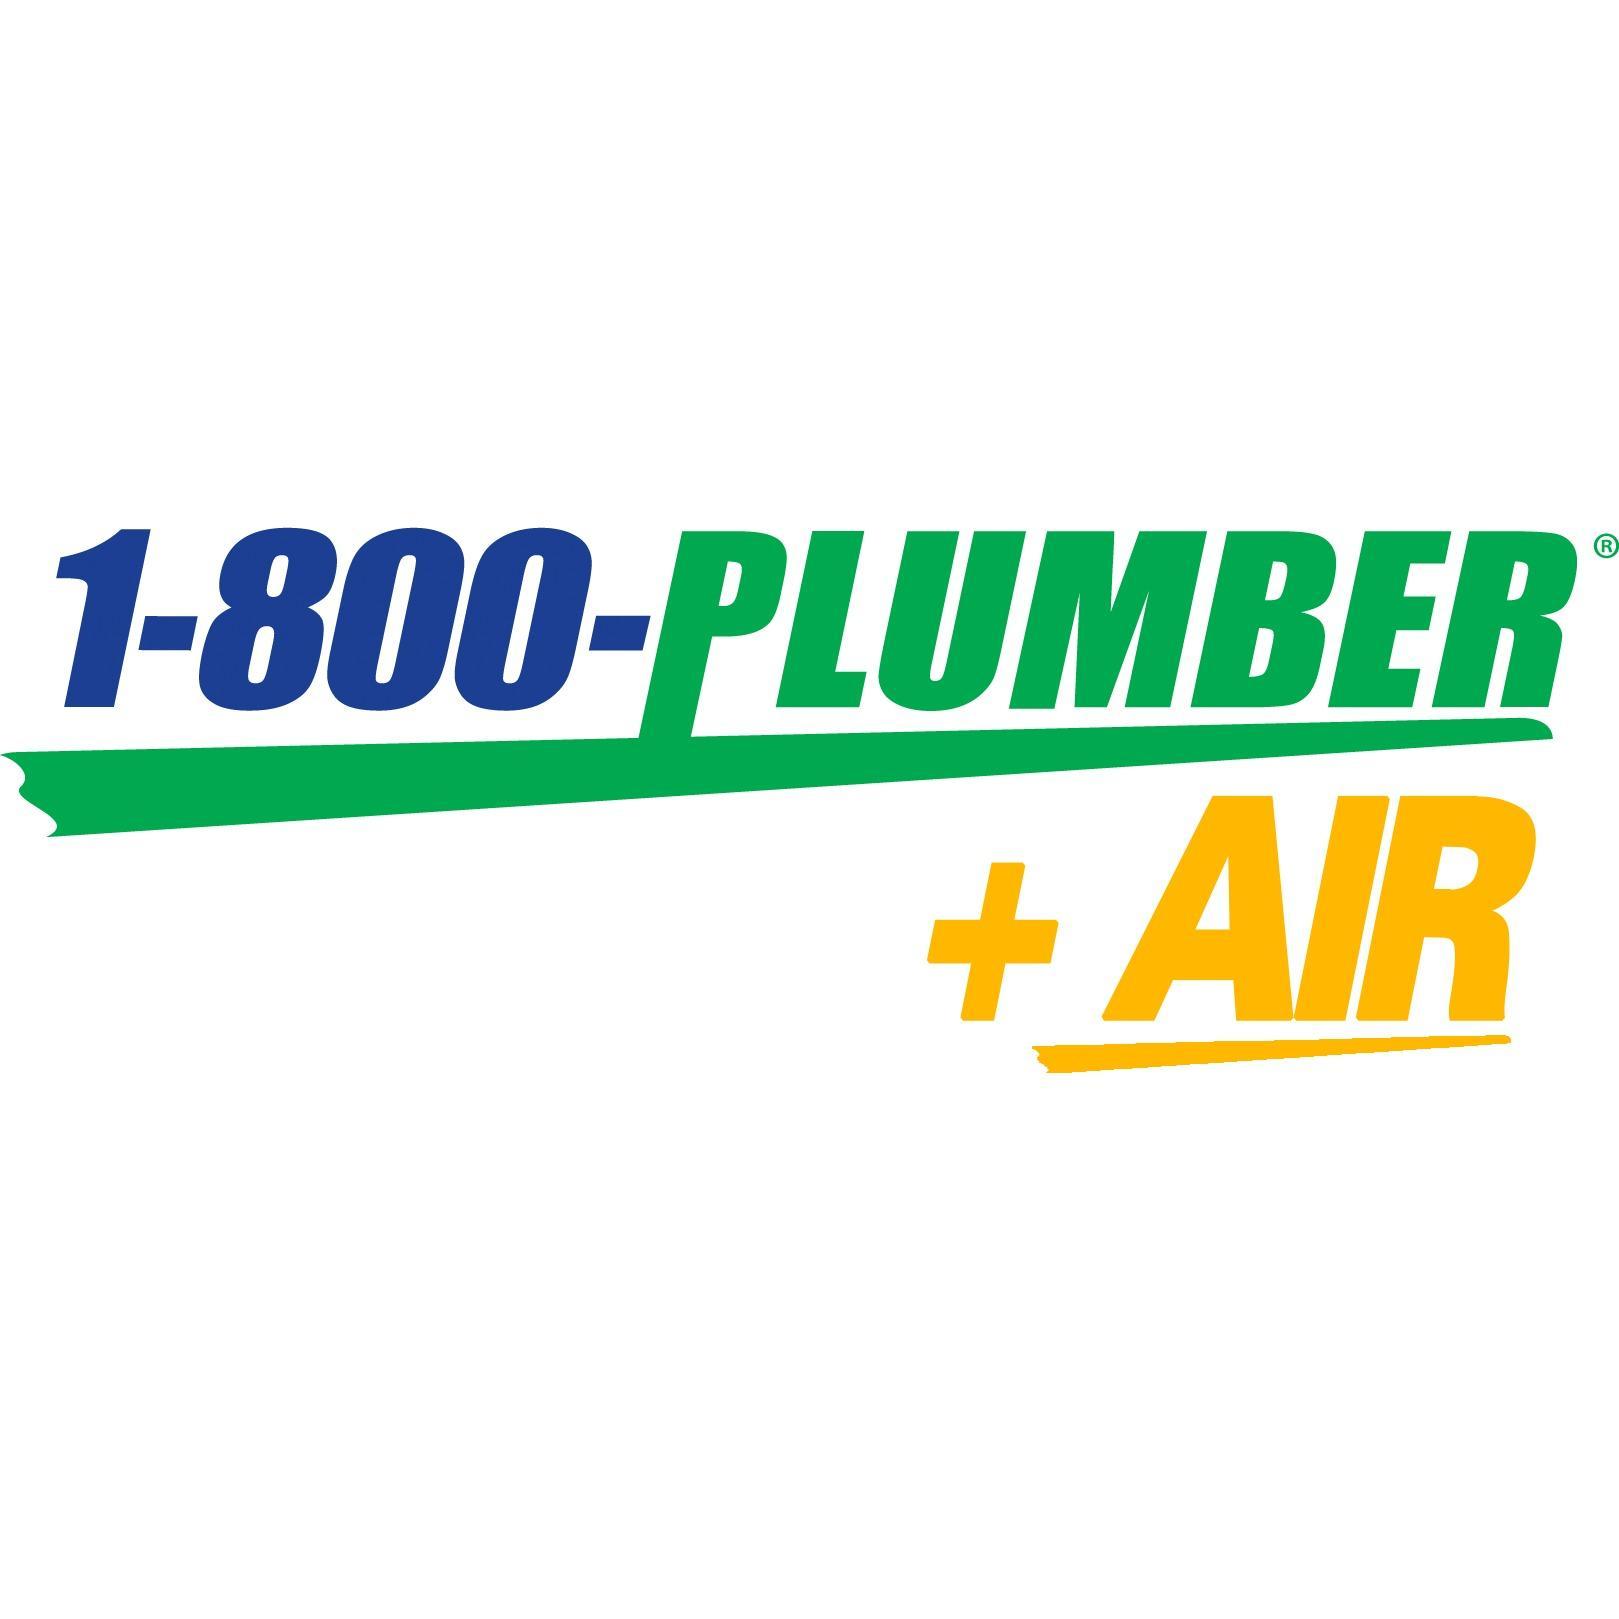 1-800-Plumber+Air of Southern Louisiana